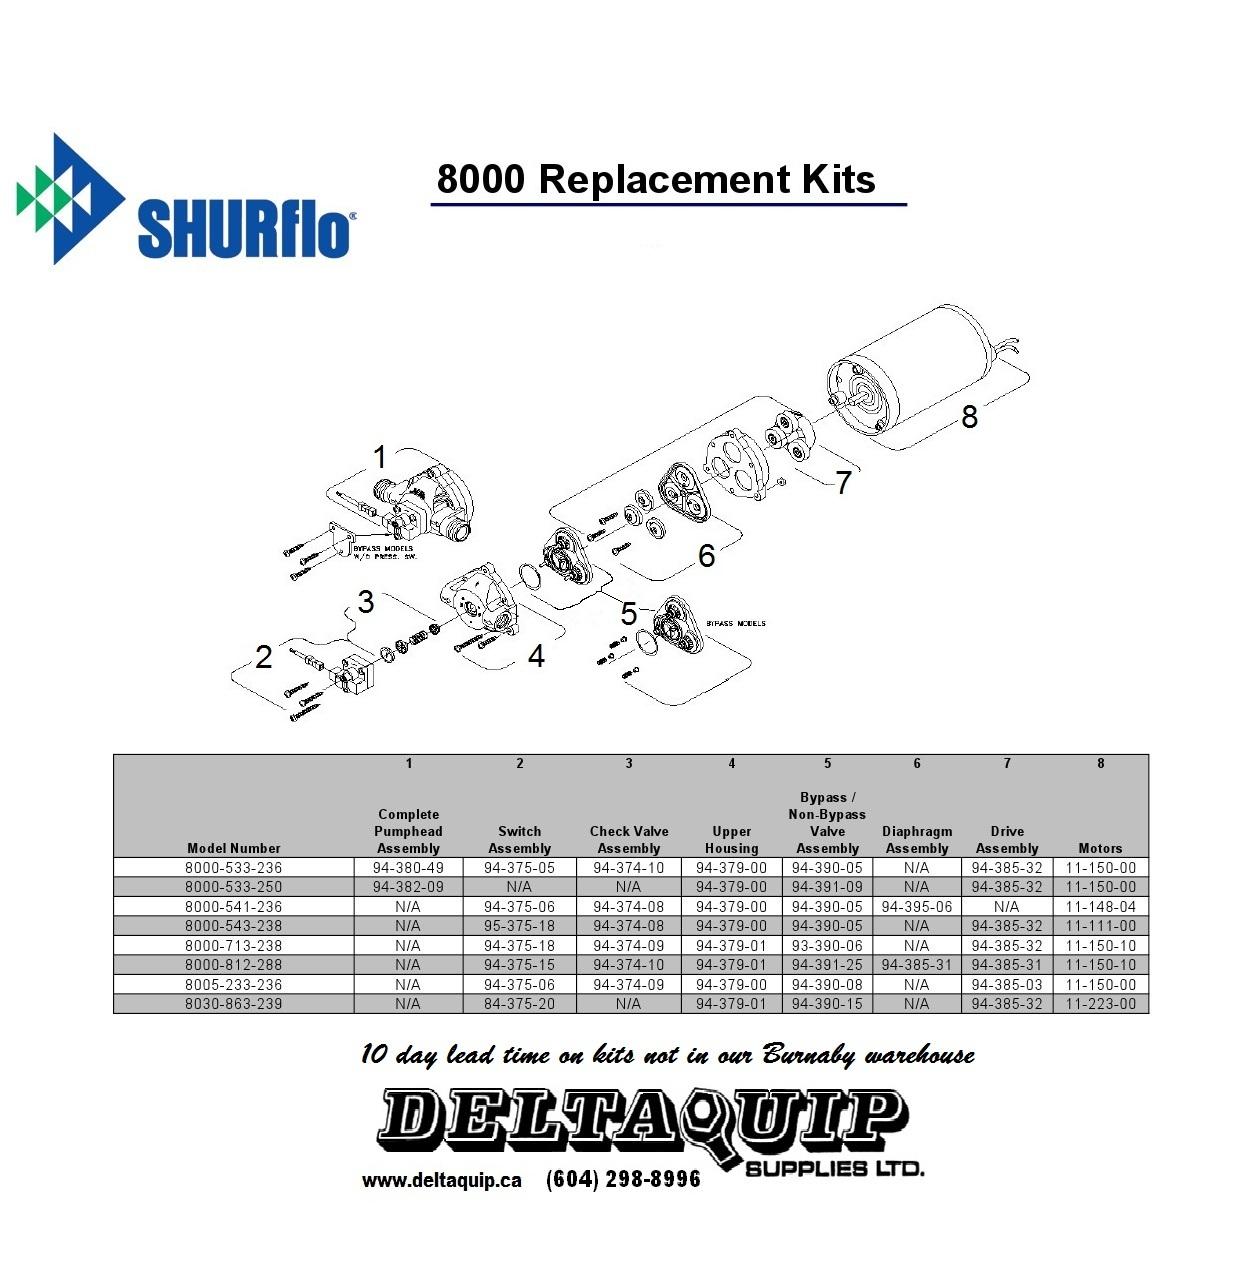 shurflo 8000 series pumps  u00bb deltaquip supplies ltd